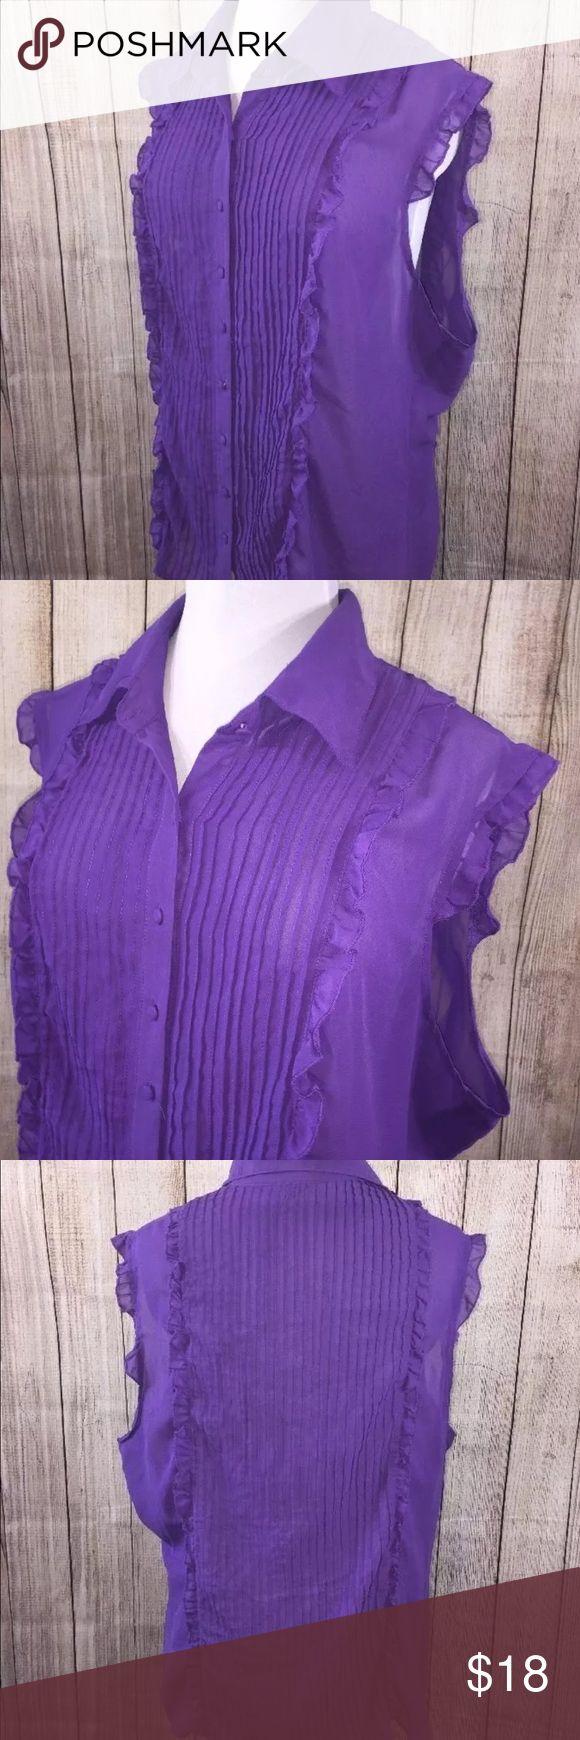 "ALI & KRIS Sleeveless Ruffle Woman's Plus Sz 3X ALI & KRIS Sleeveless Ruffle Pleated SHIRT BLOUSE Purple Woman's Plus Sz 3X  Length 29"" Underarm to underarm 25 1/2"" Ali & Kris Tops Blouses"